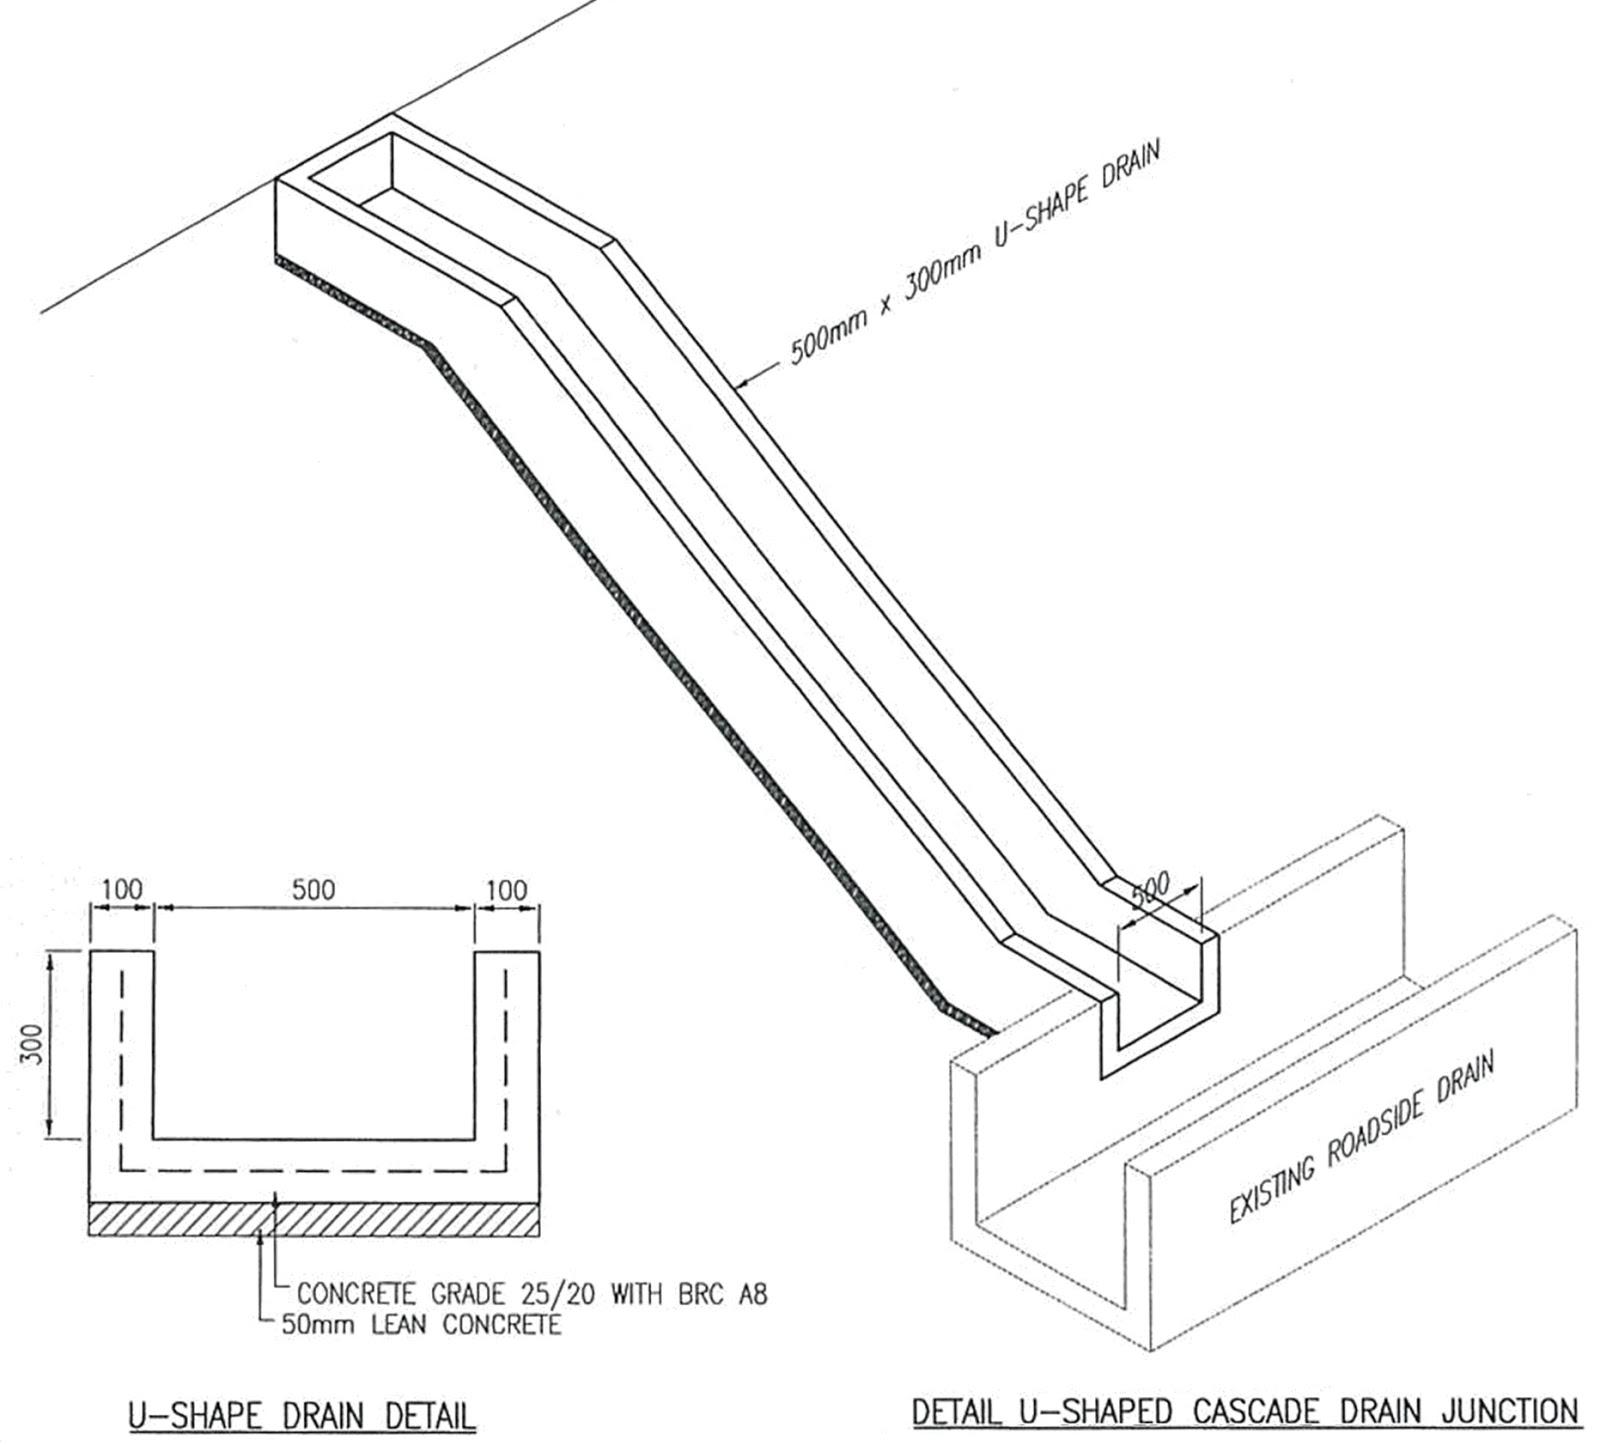 Satriafusuzu blogspot furthermore Measuring Eave Height furthermore Lot D1c994f1 B091 42b6 9b7f A53100cd57d4 moreover Quality control additionally Cascade Drain Chute Drain. on lean construction